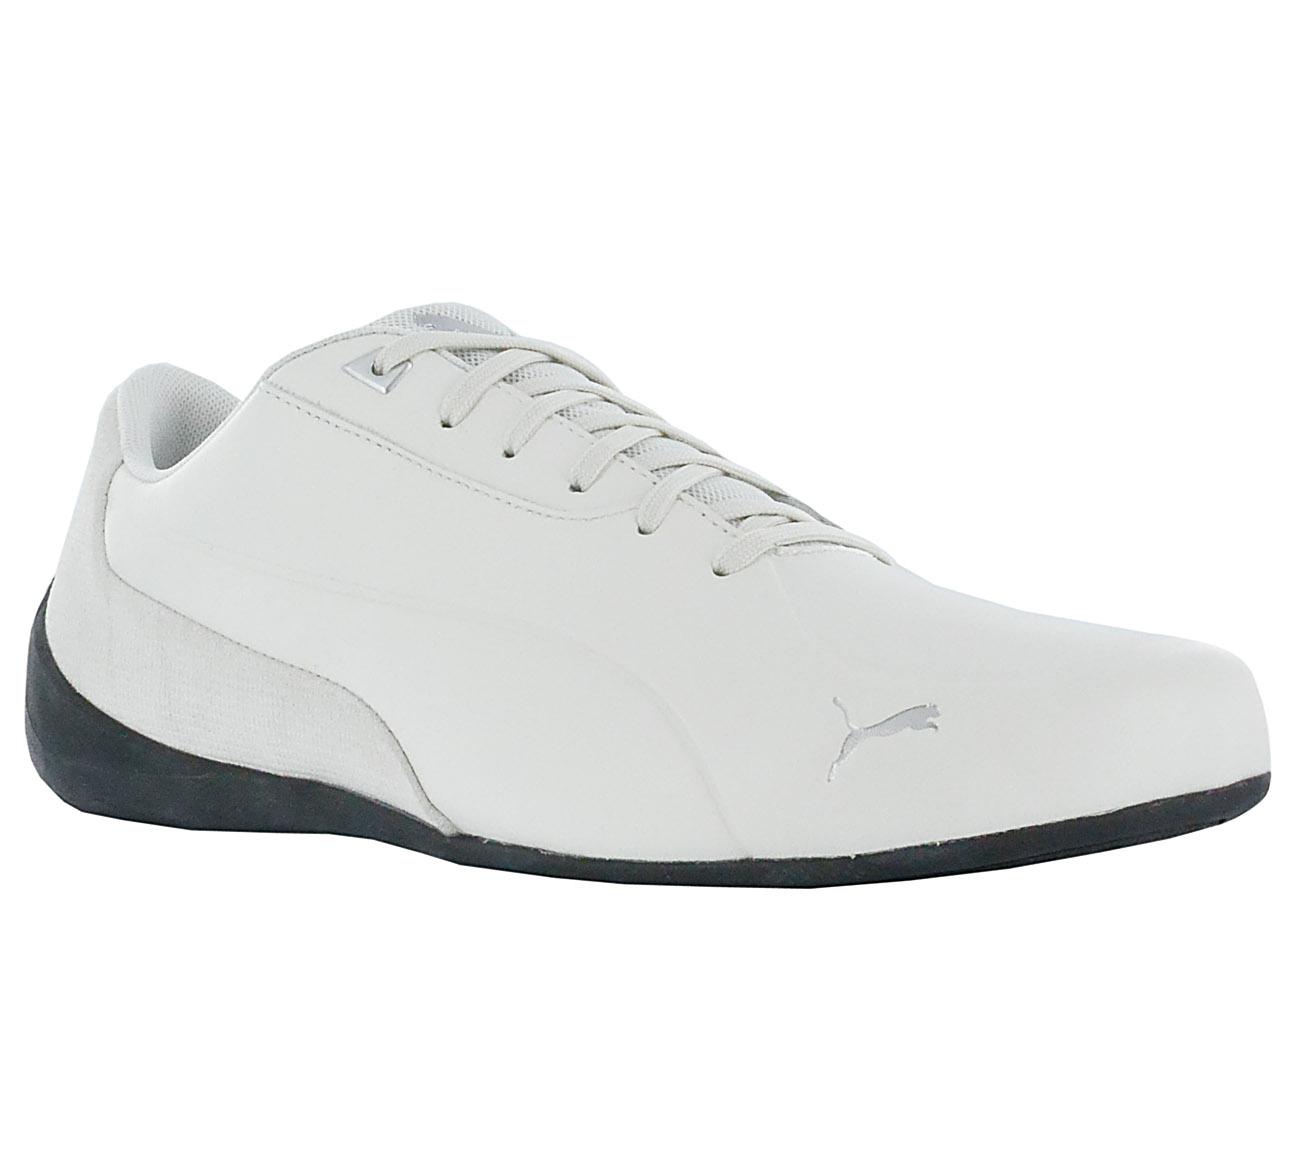 bd2cb10f0c5a5e Puma Men s Sneakers Drift Cat 7 Cln Shoes Grey Leather Motorsport ...